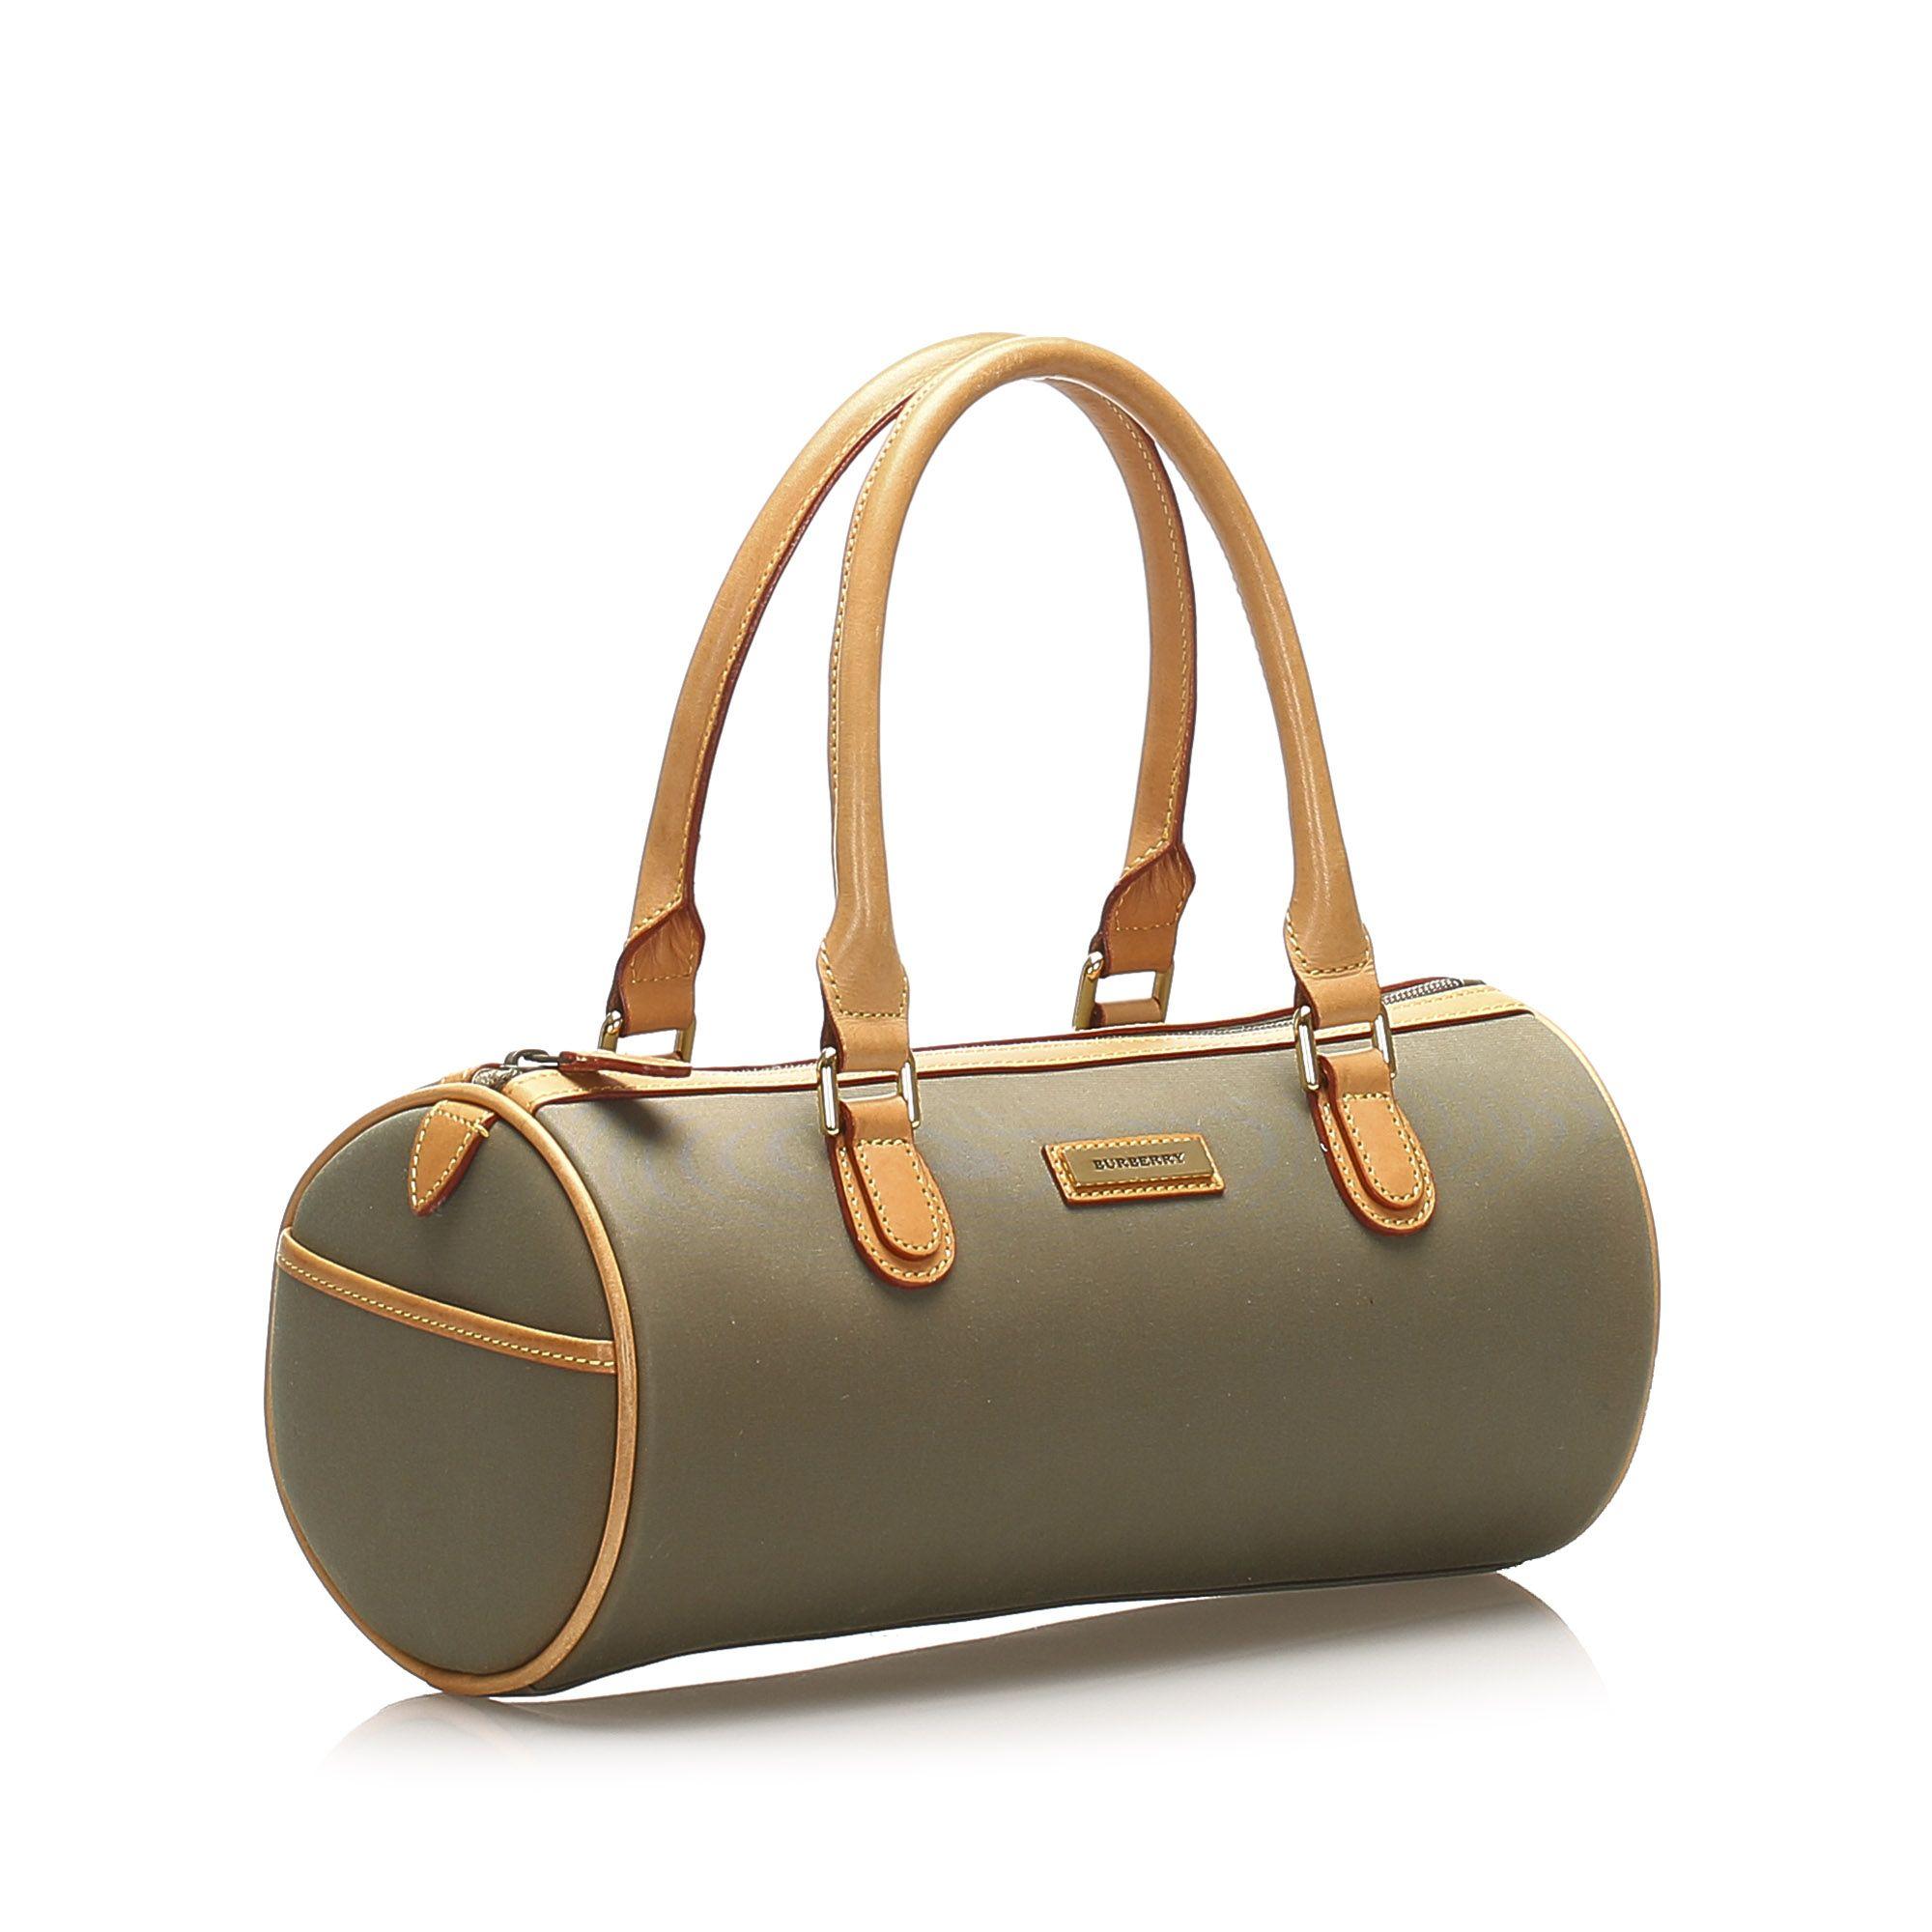 Vintage Burberry Leather Handbag Green